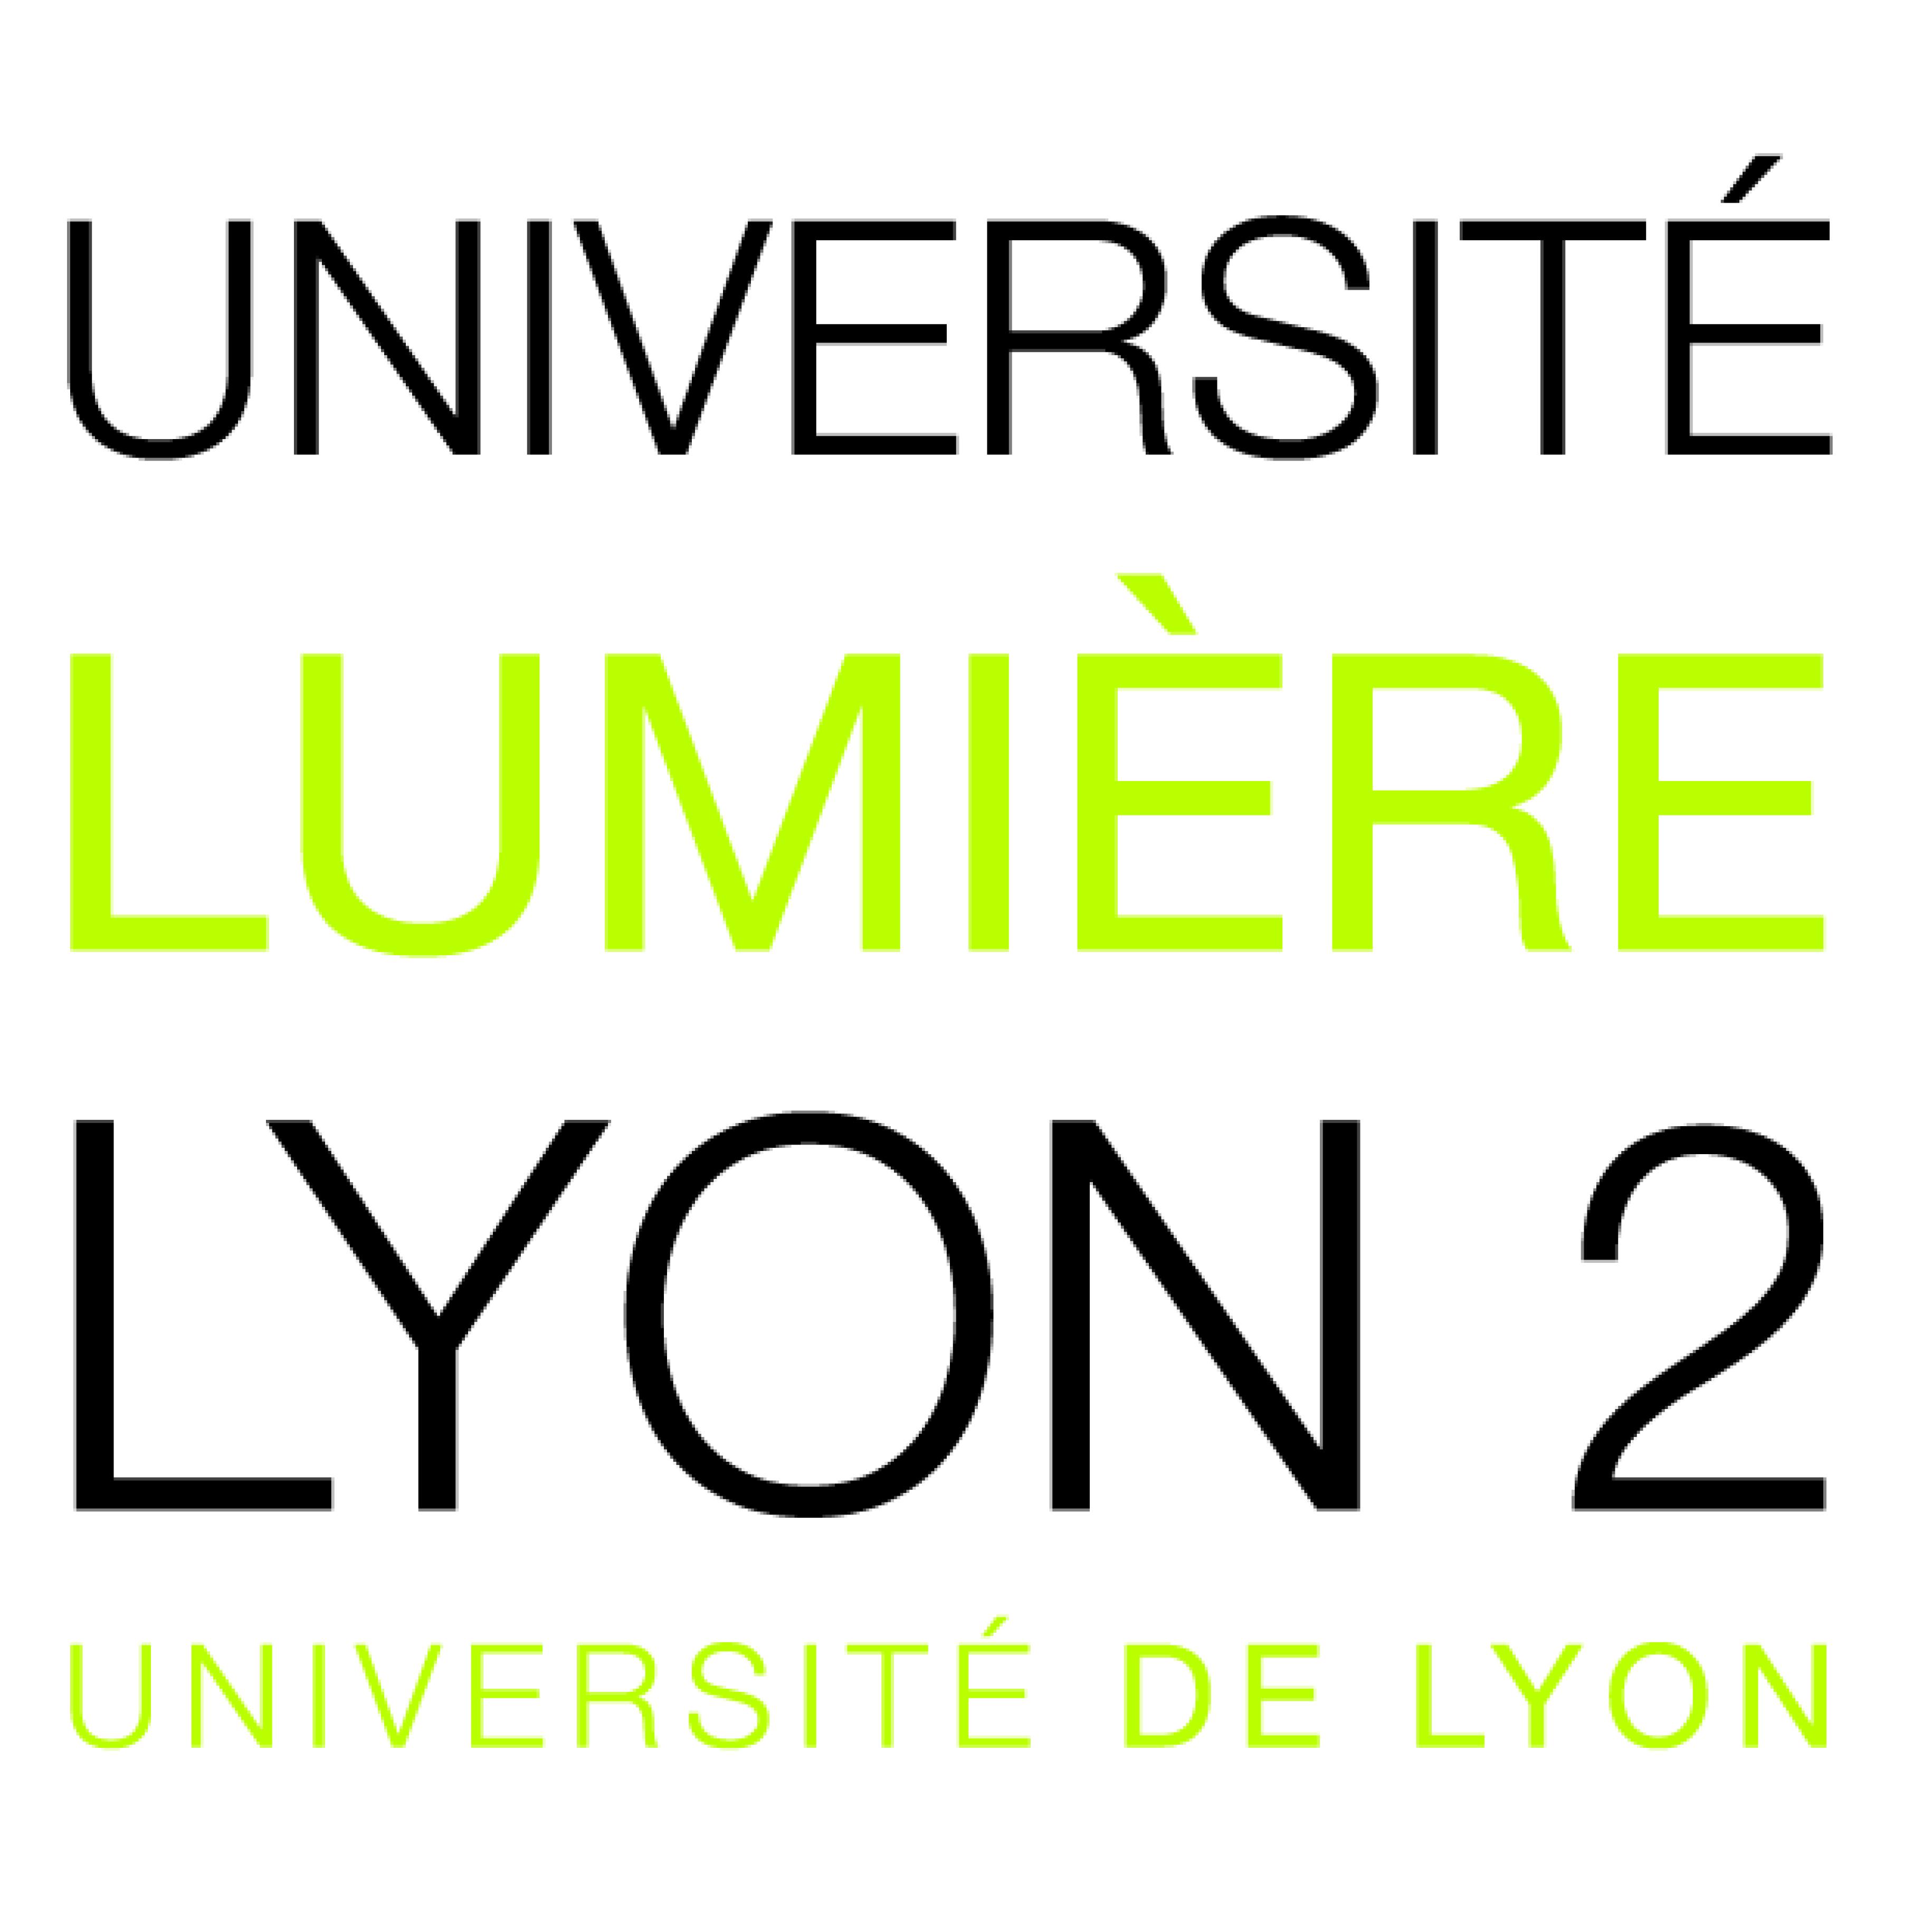 Bureau Virtuel Lyon 2